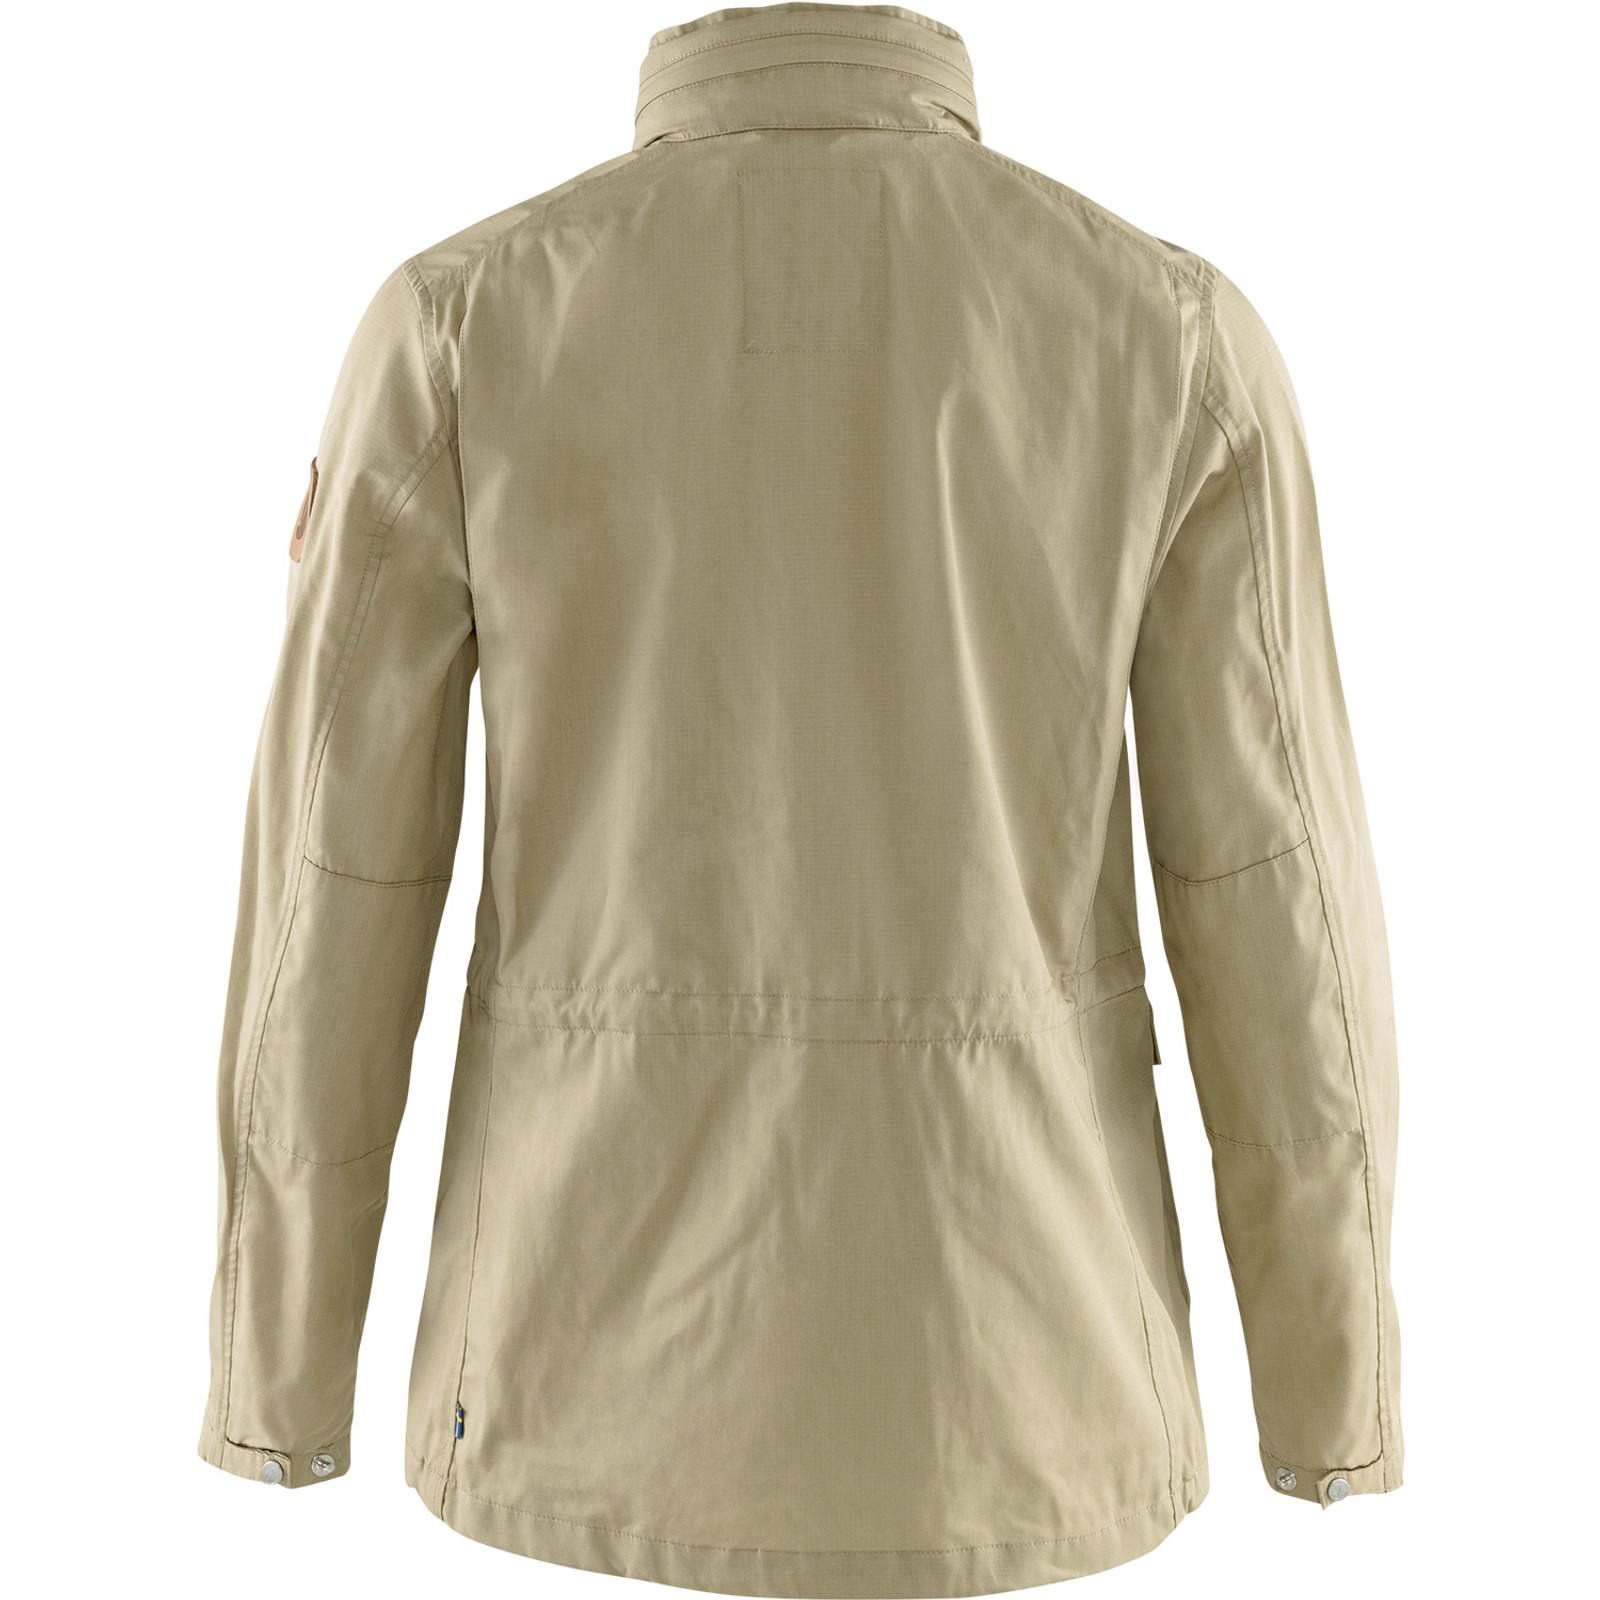 Fjällräven Räven Lite Jacket, Women's, Sandstone - F83517-195 back